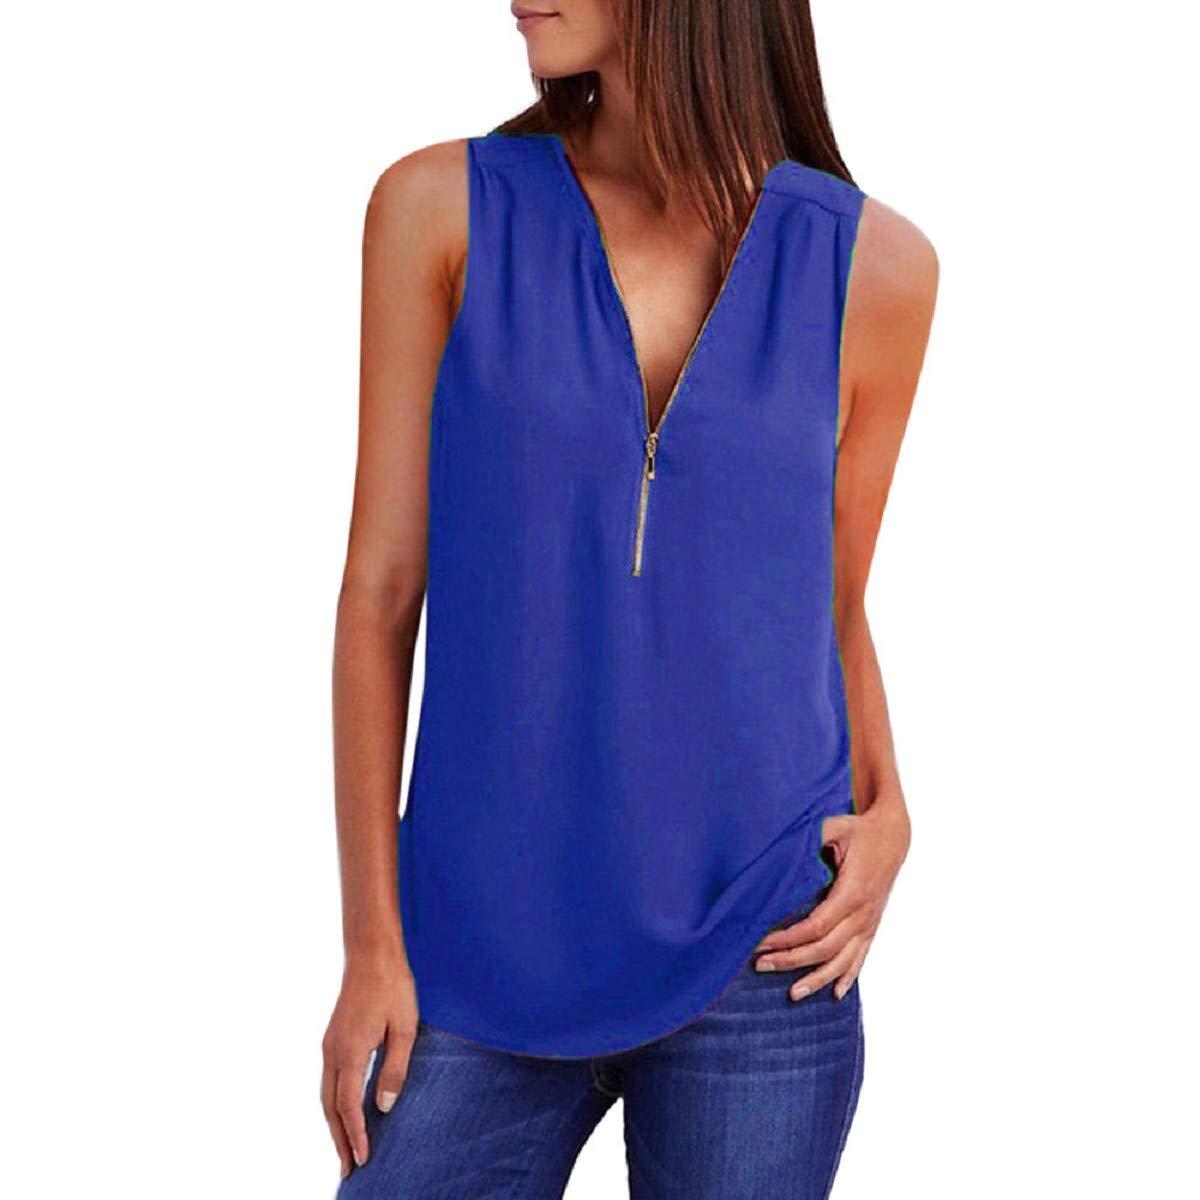 OTINICE Women Tank Top Chiffon Sleeveless V-Neck Zipper Loose Fashion T-Shirt Summer Blouse Blue